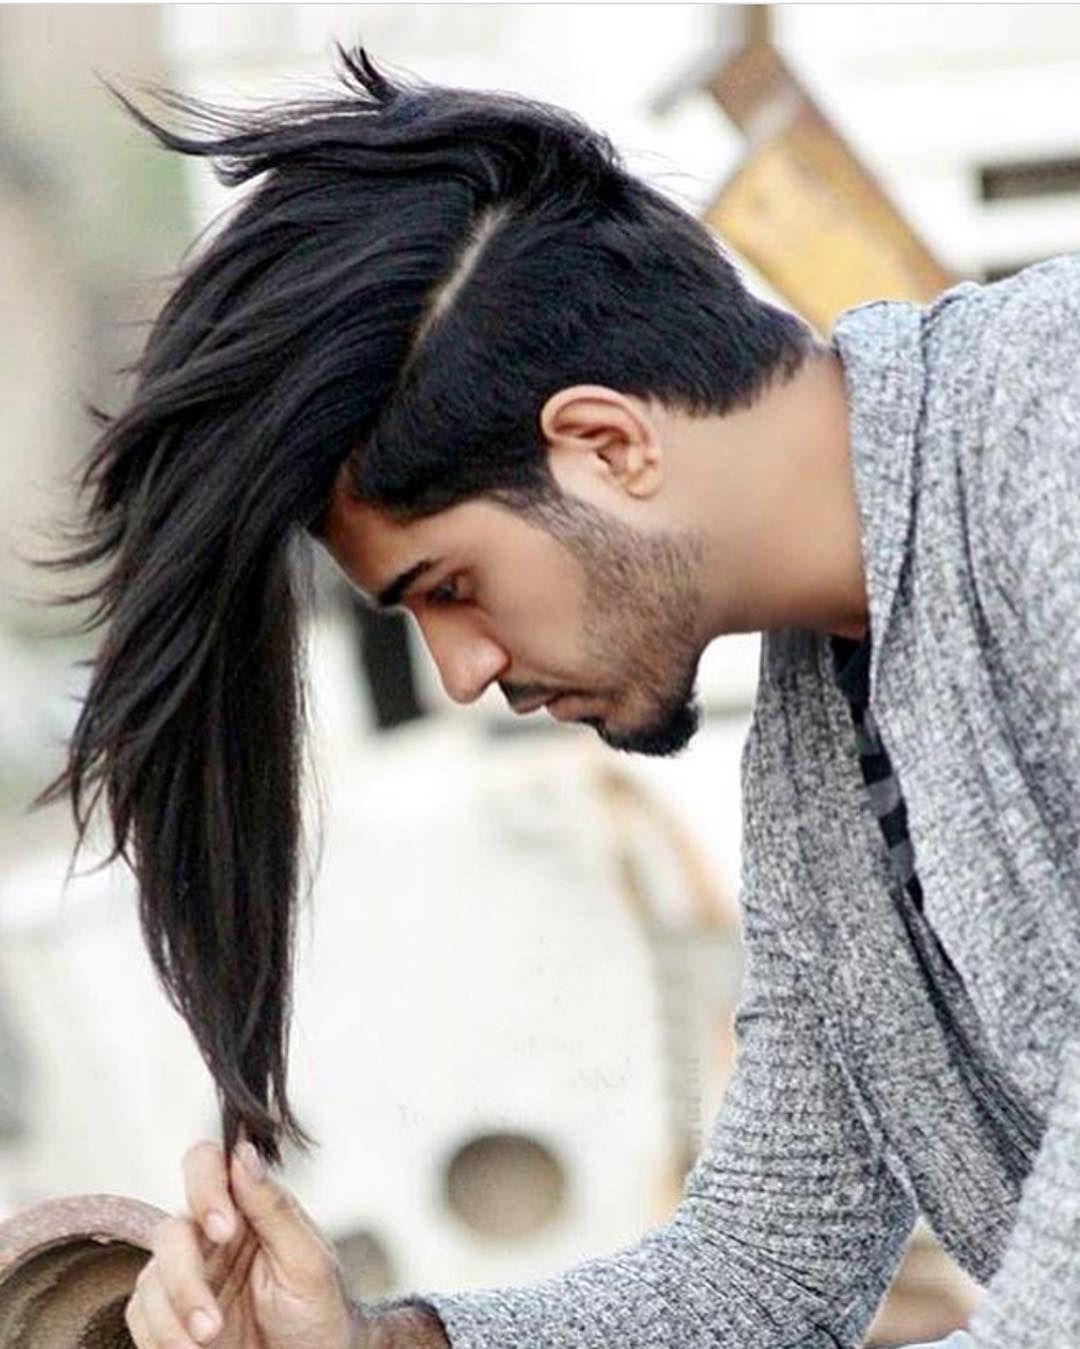 Classic Black Long Hairstyles Long Hair Styles Men Boy Hairstyles Boys Long Hairstyles